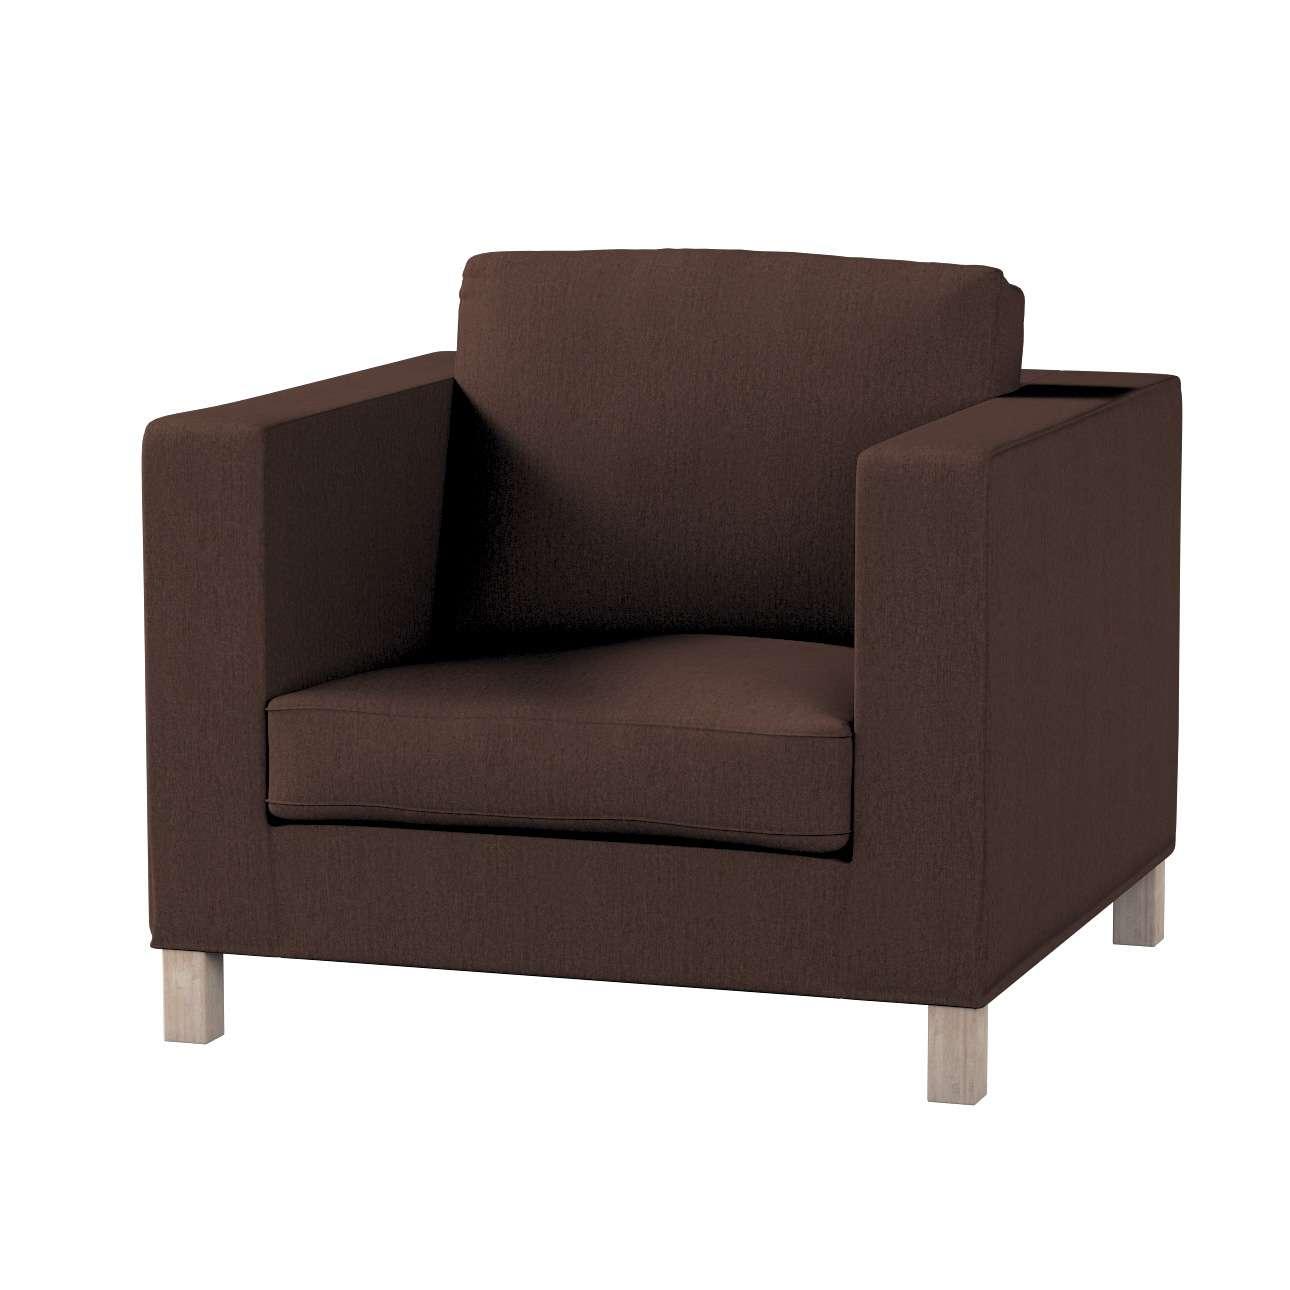 Pokrowiec na fotel Karlanda, krótki fotel Karlanda w kolekcji Chenille, tkanina: 702-18